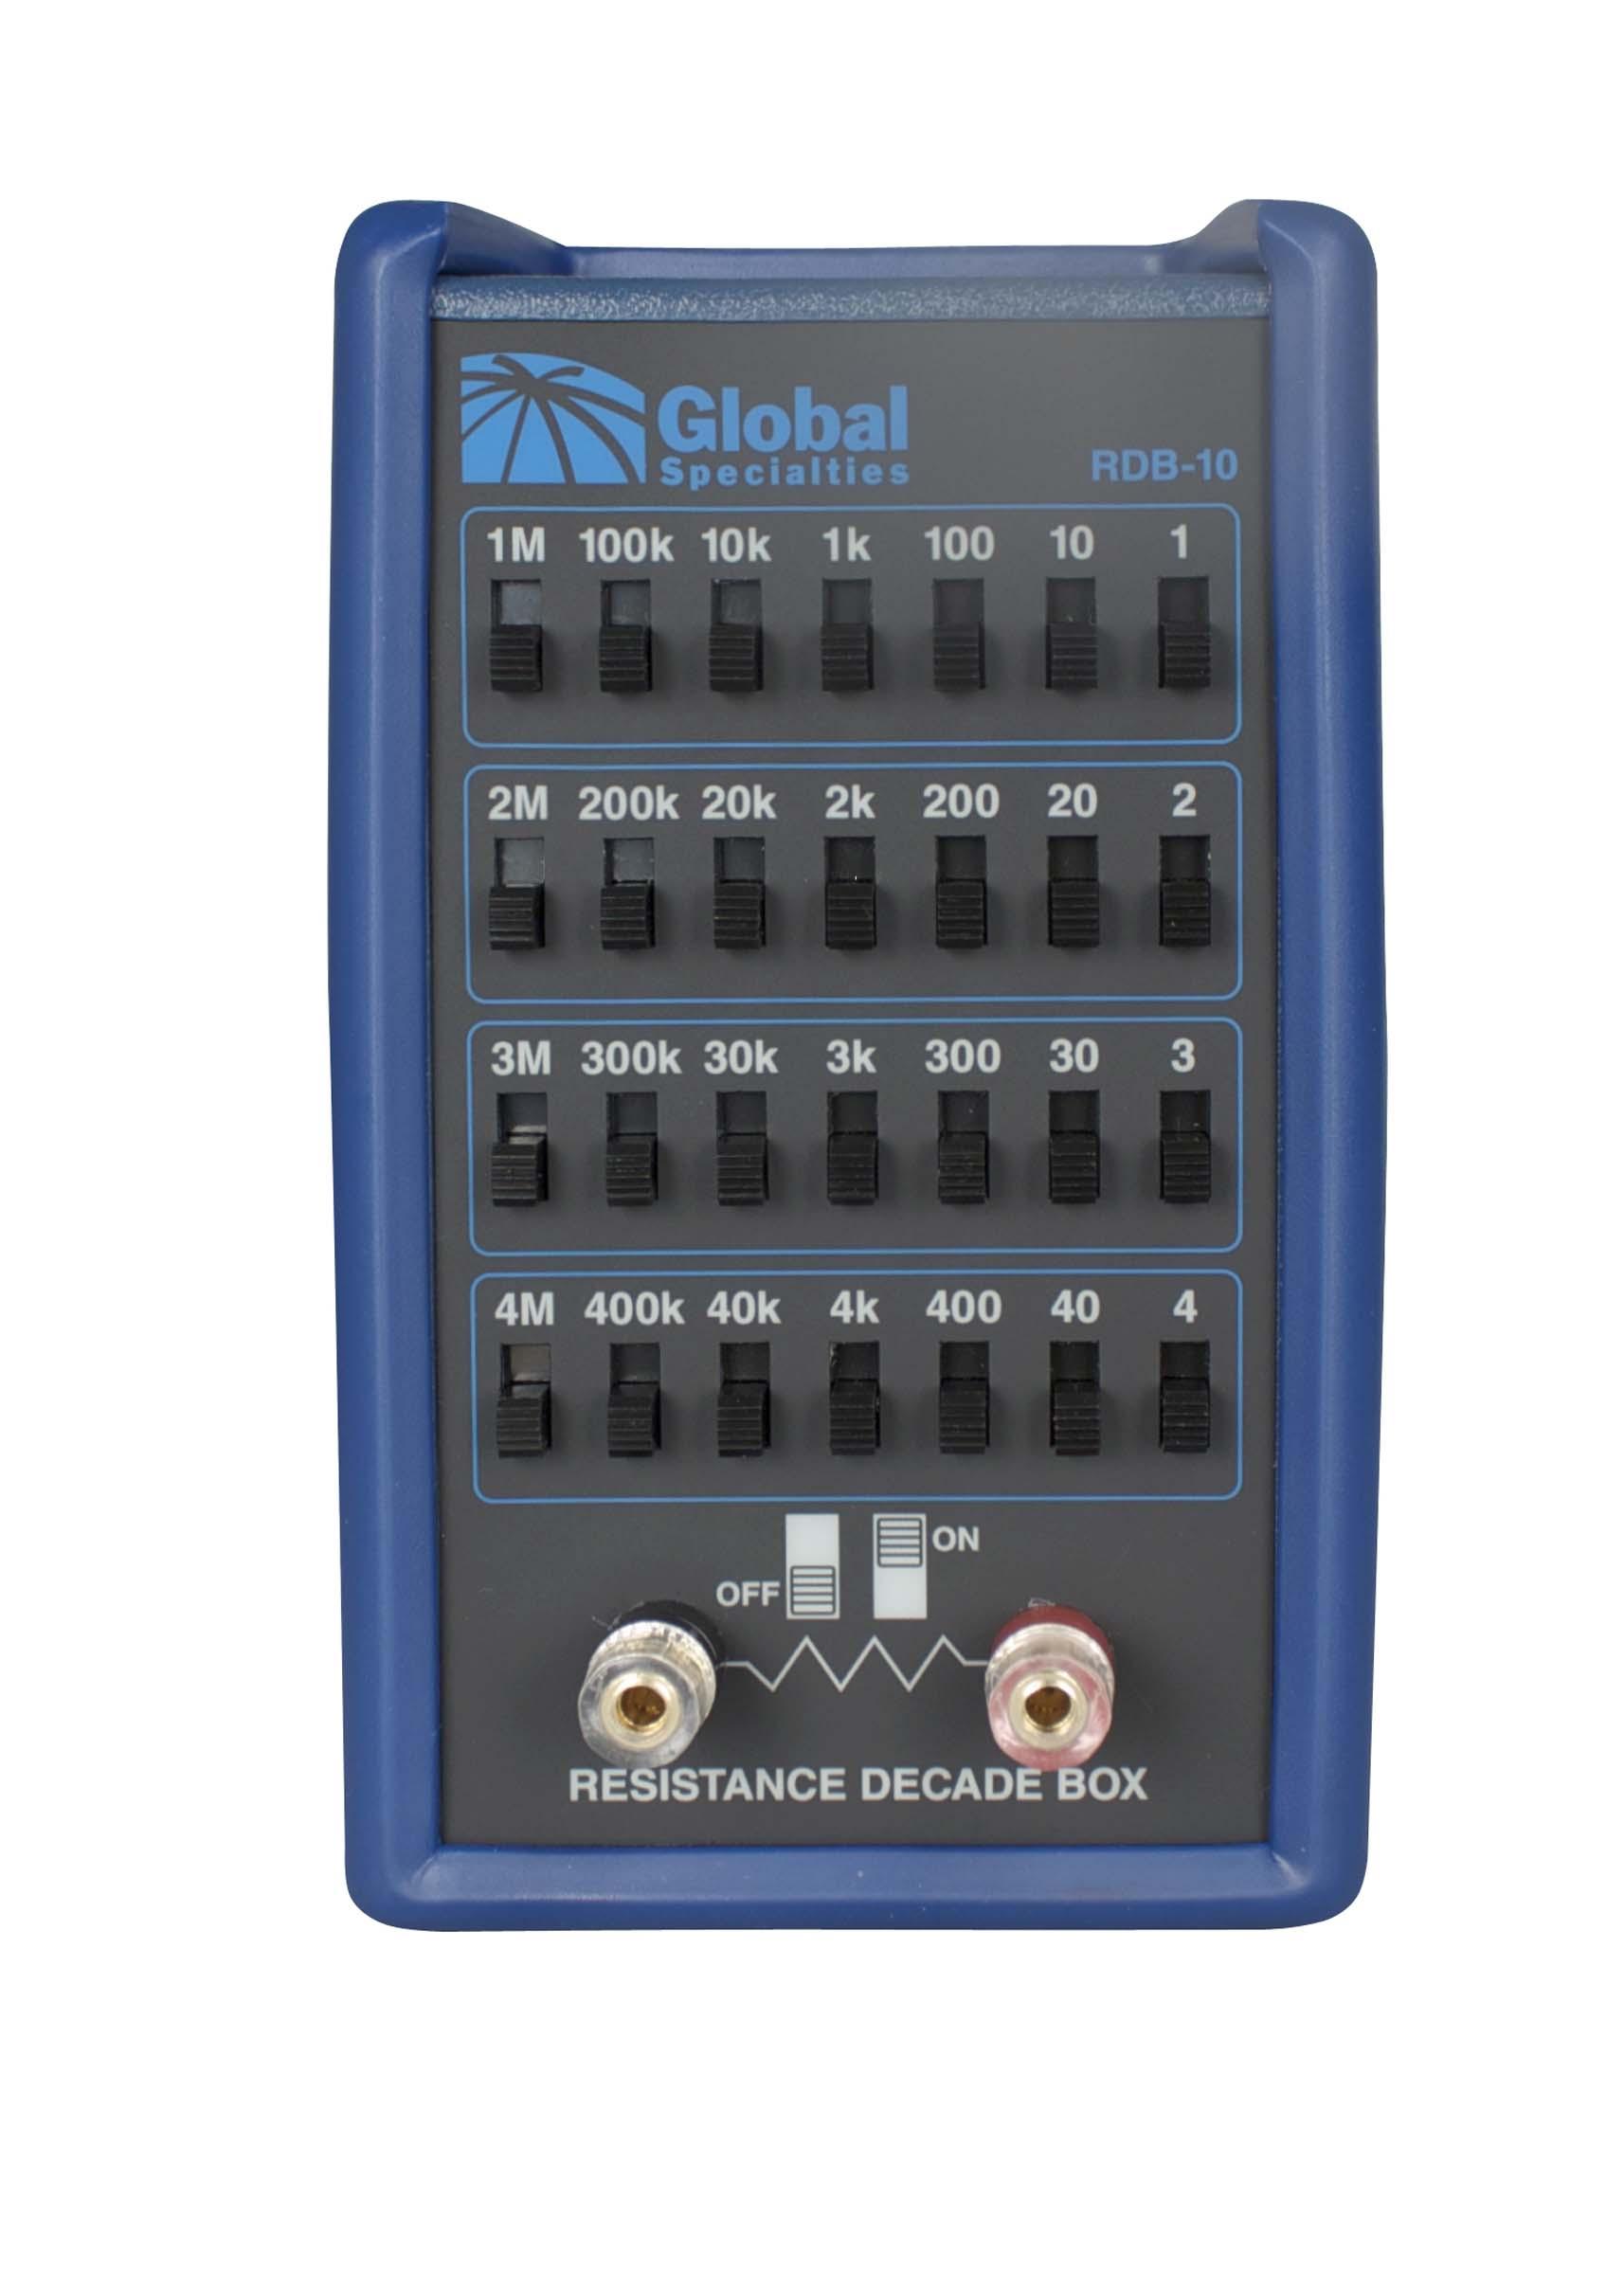 Global Specialties RDB-10 Resistance Decade Box Photo